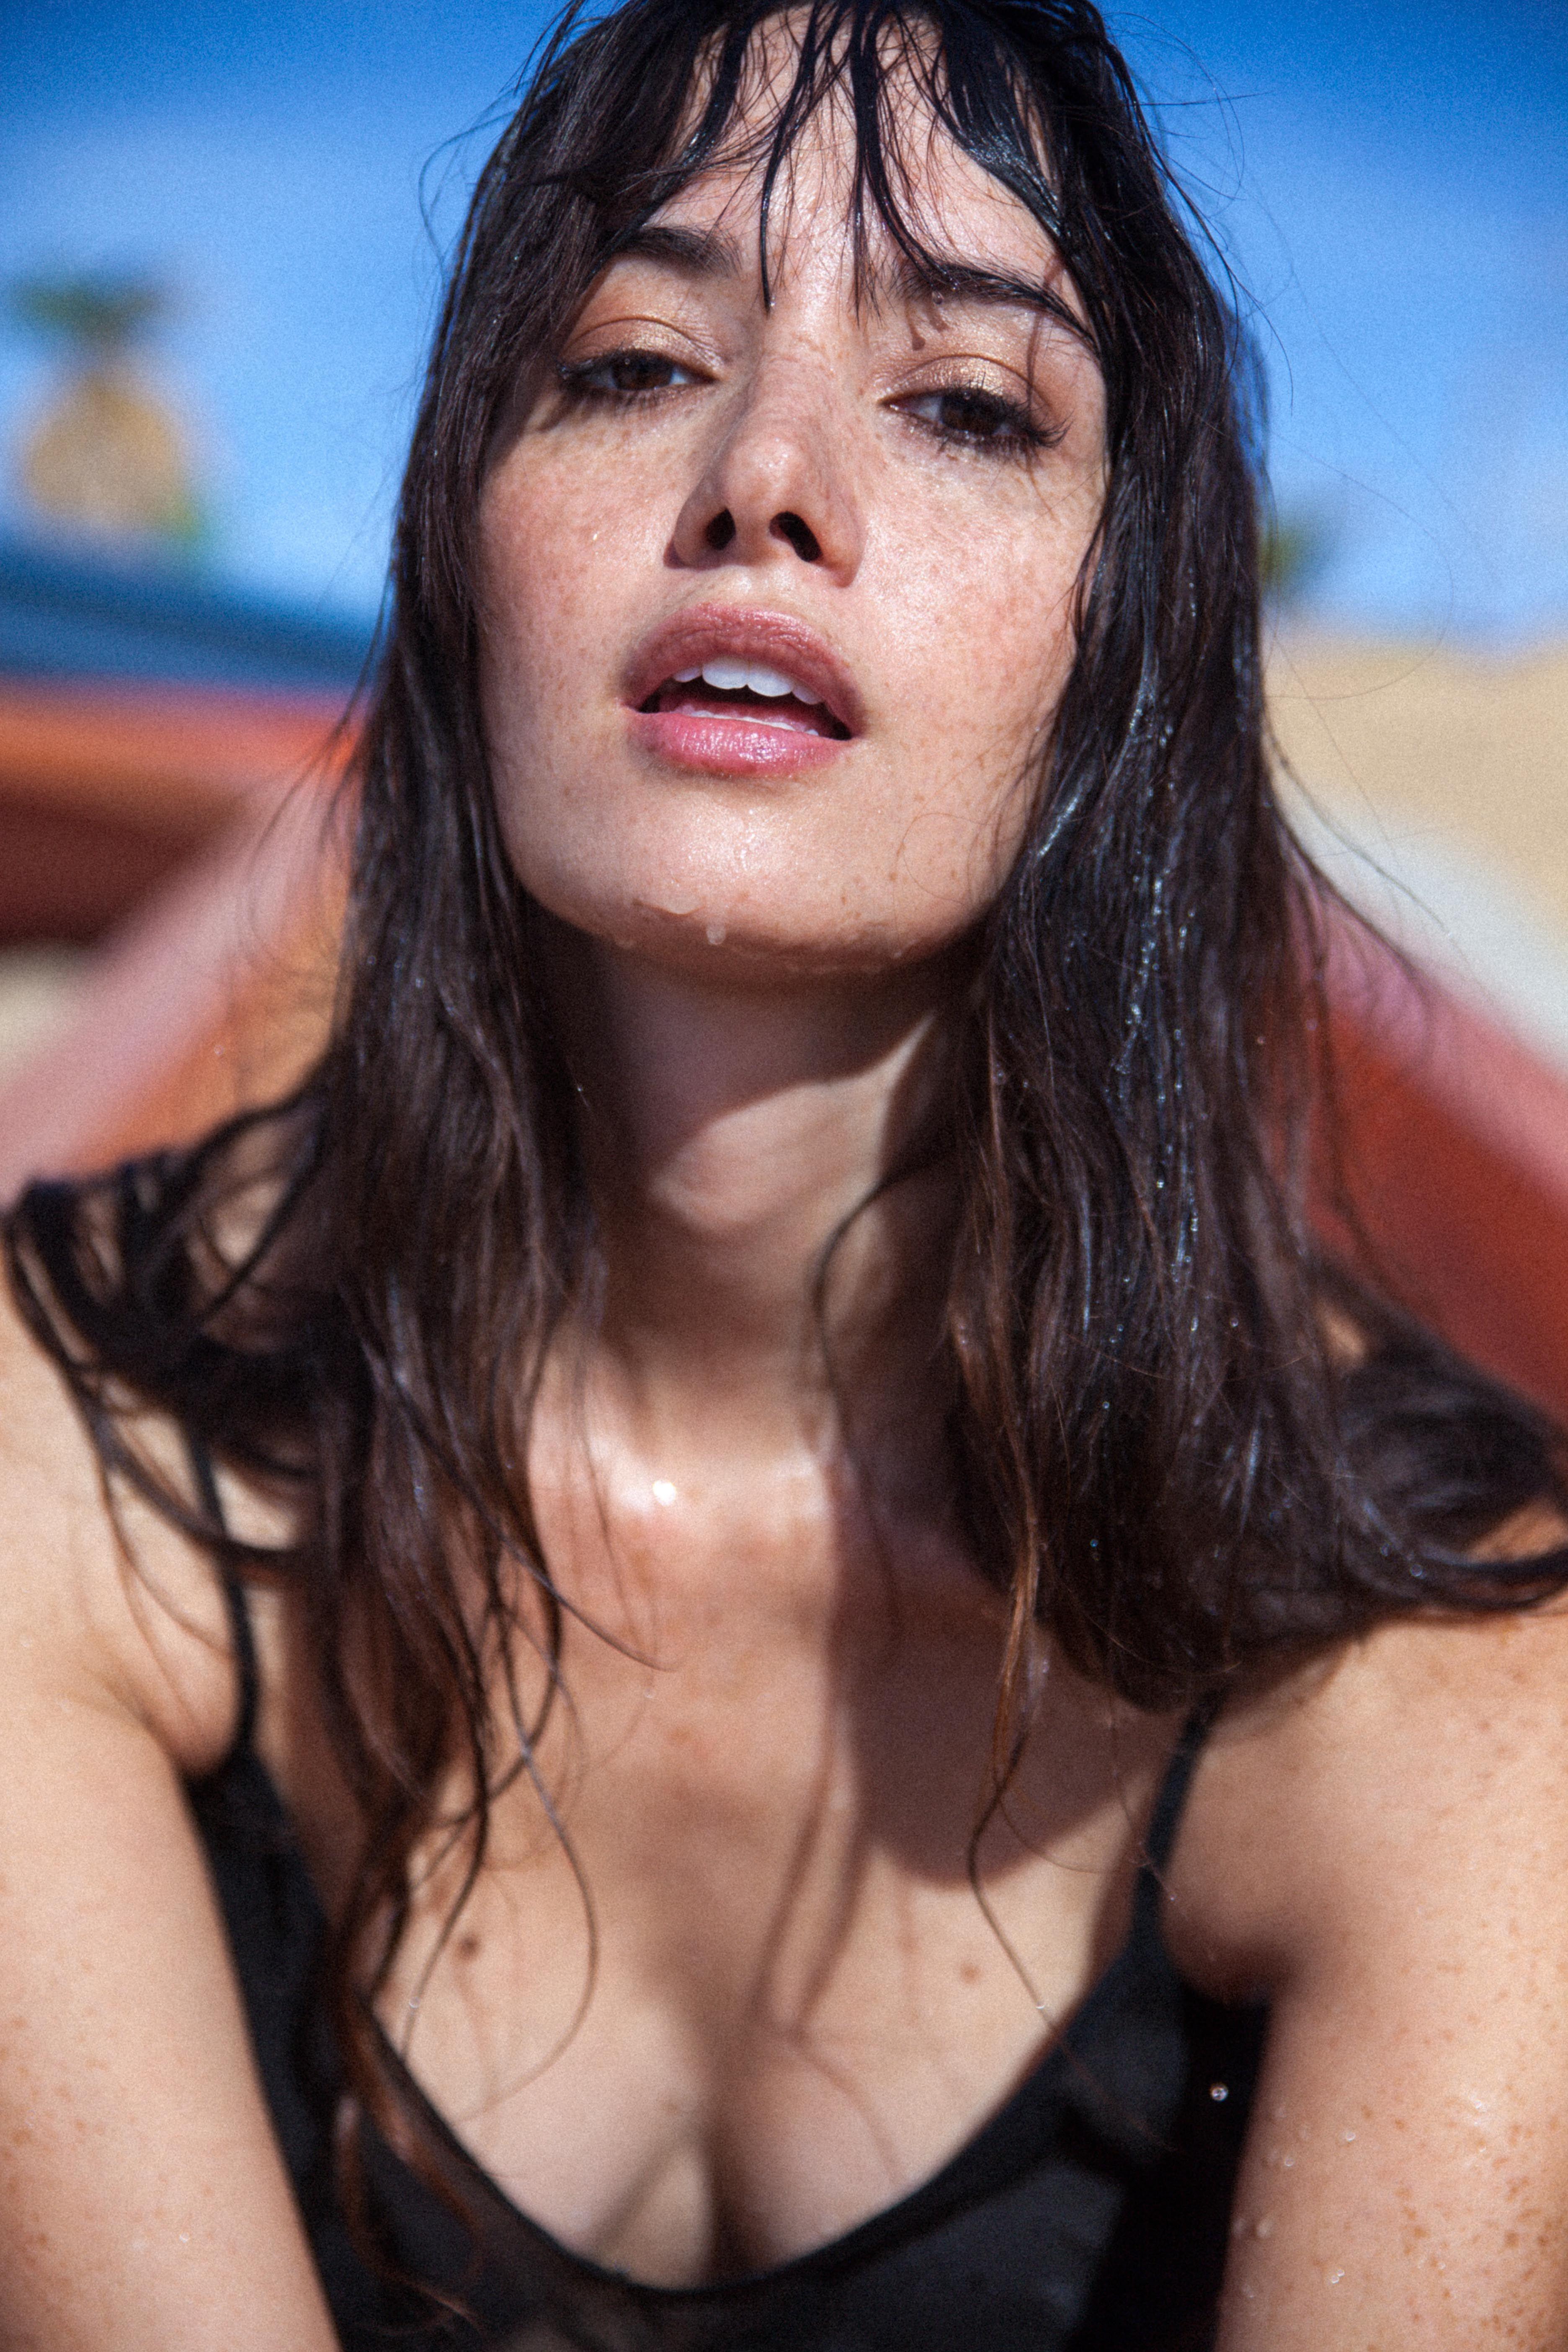 Ass Selfie Amanda Bynes naked photo 2017